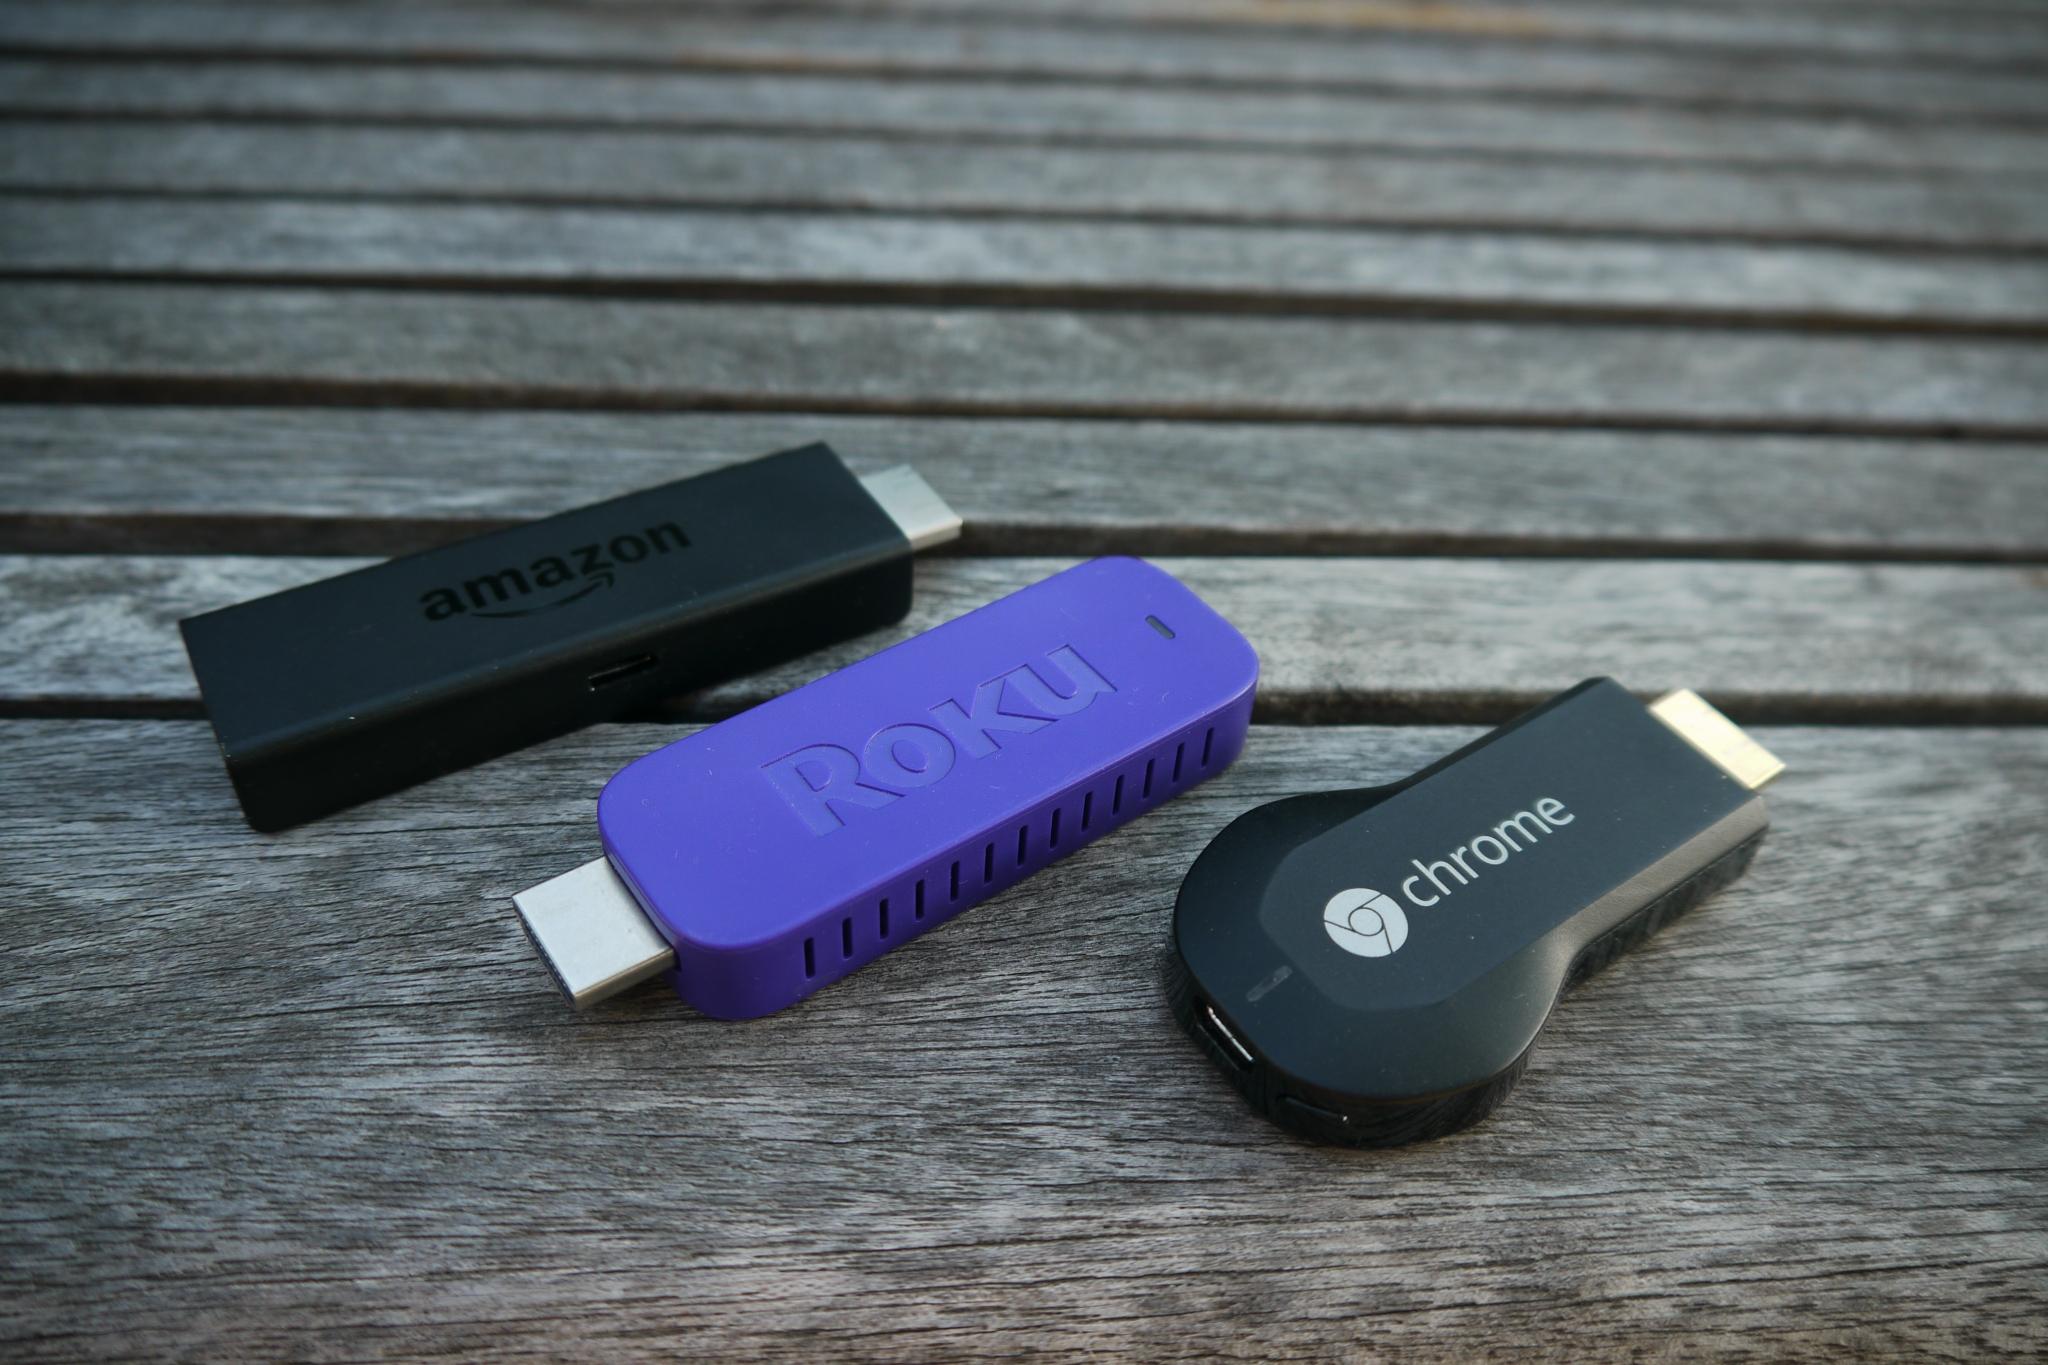 Chromecast vs Roku vs Fire TV: which streaming stick should you buy?